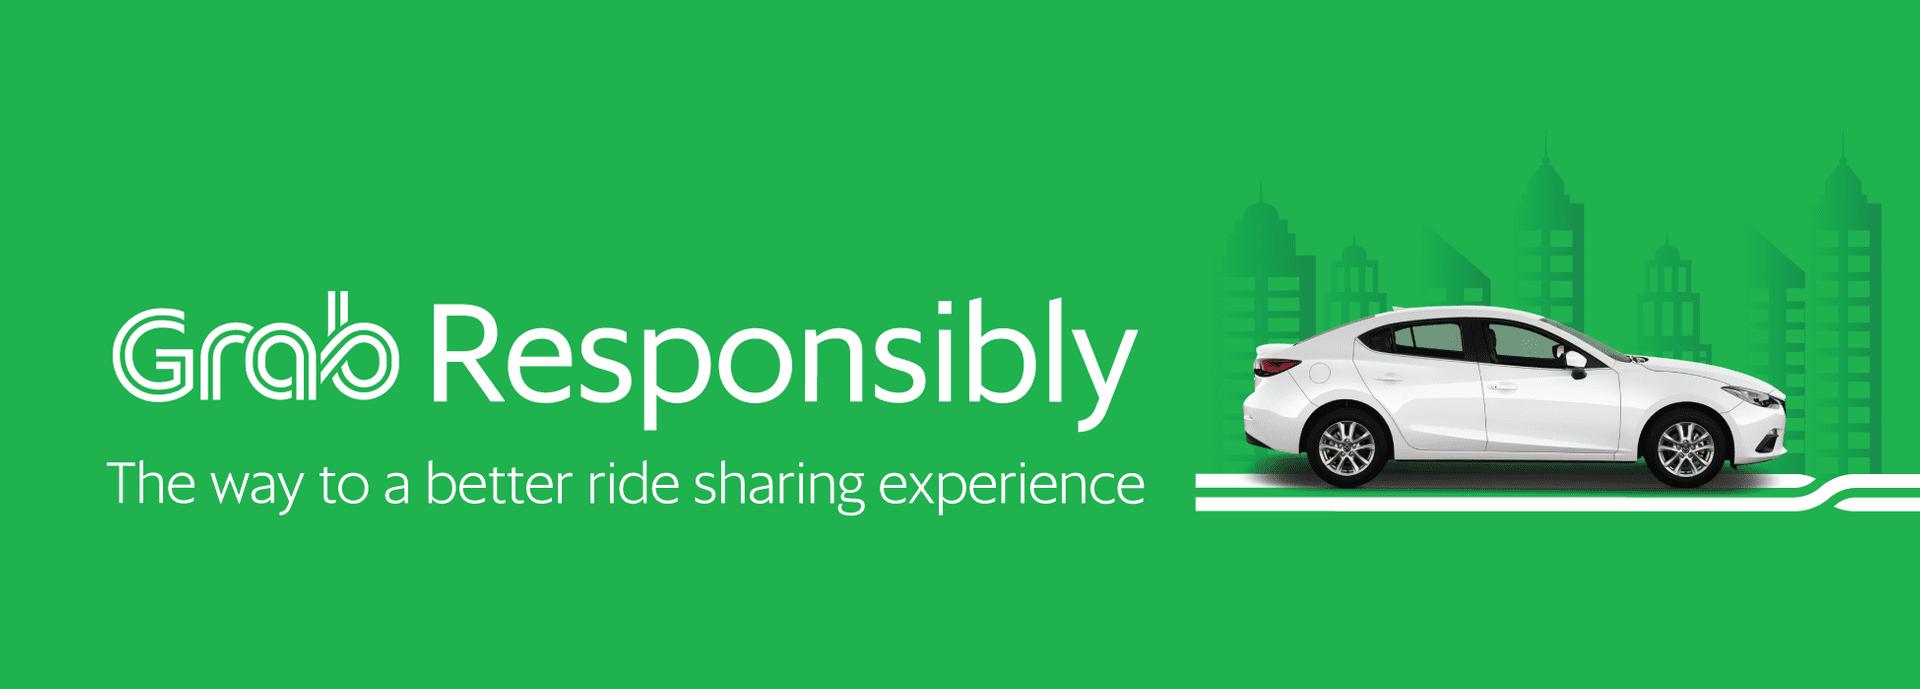 Grab Responsibly | Grab PH